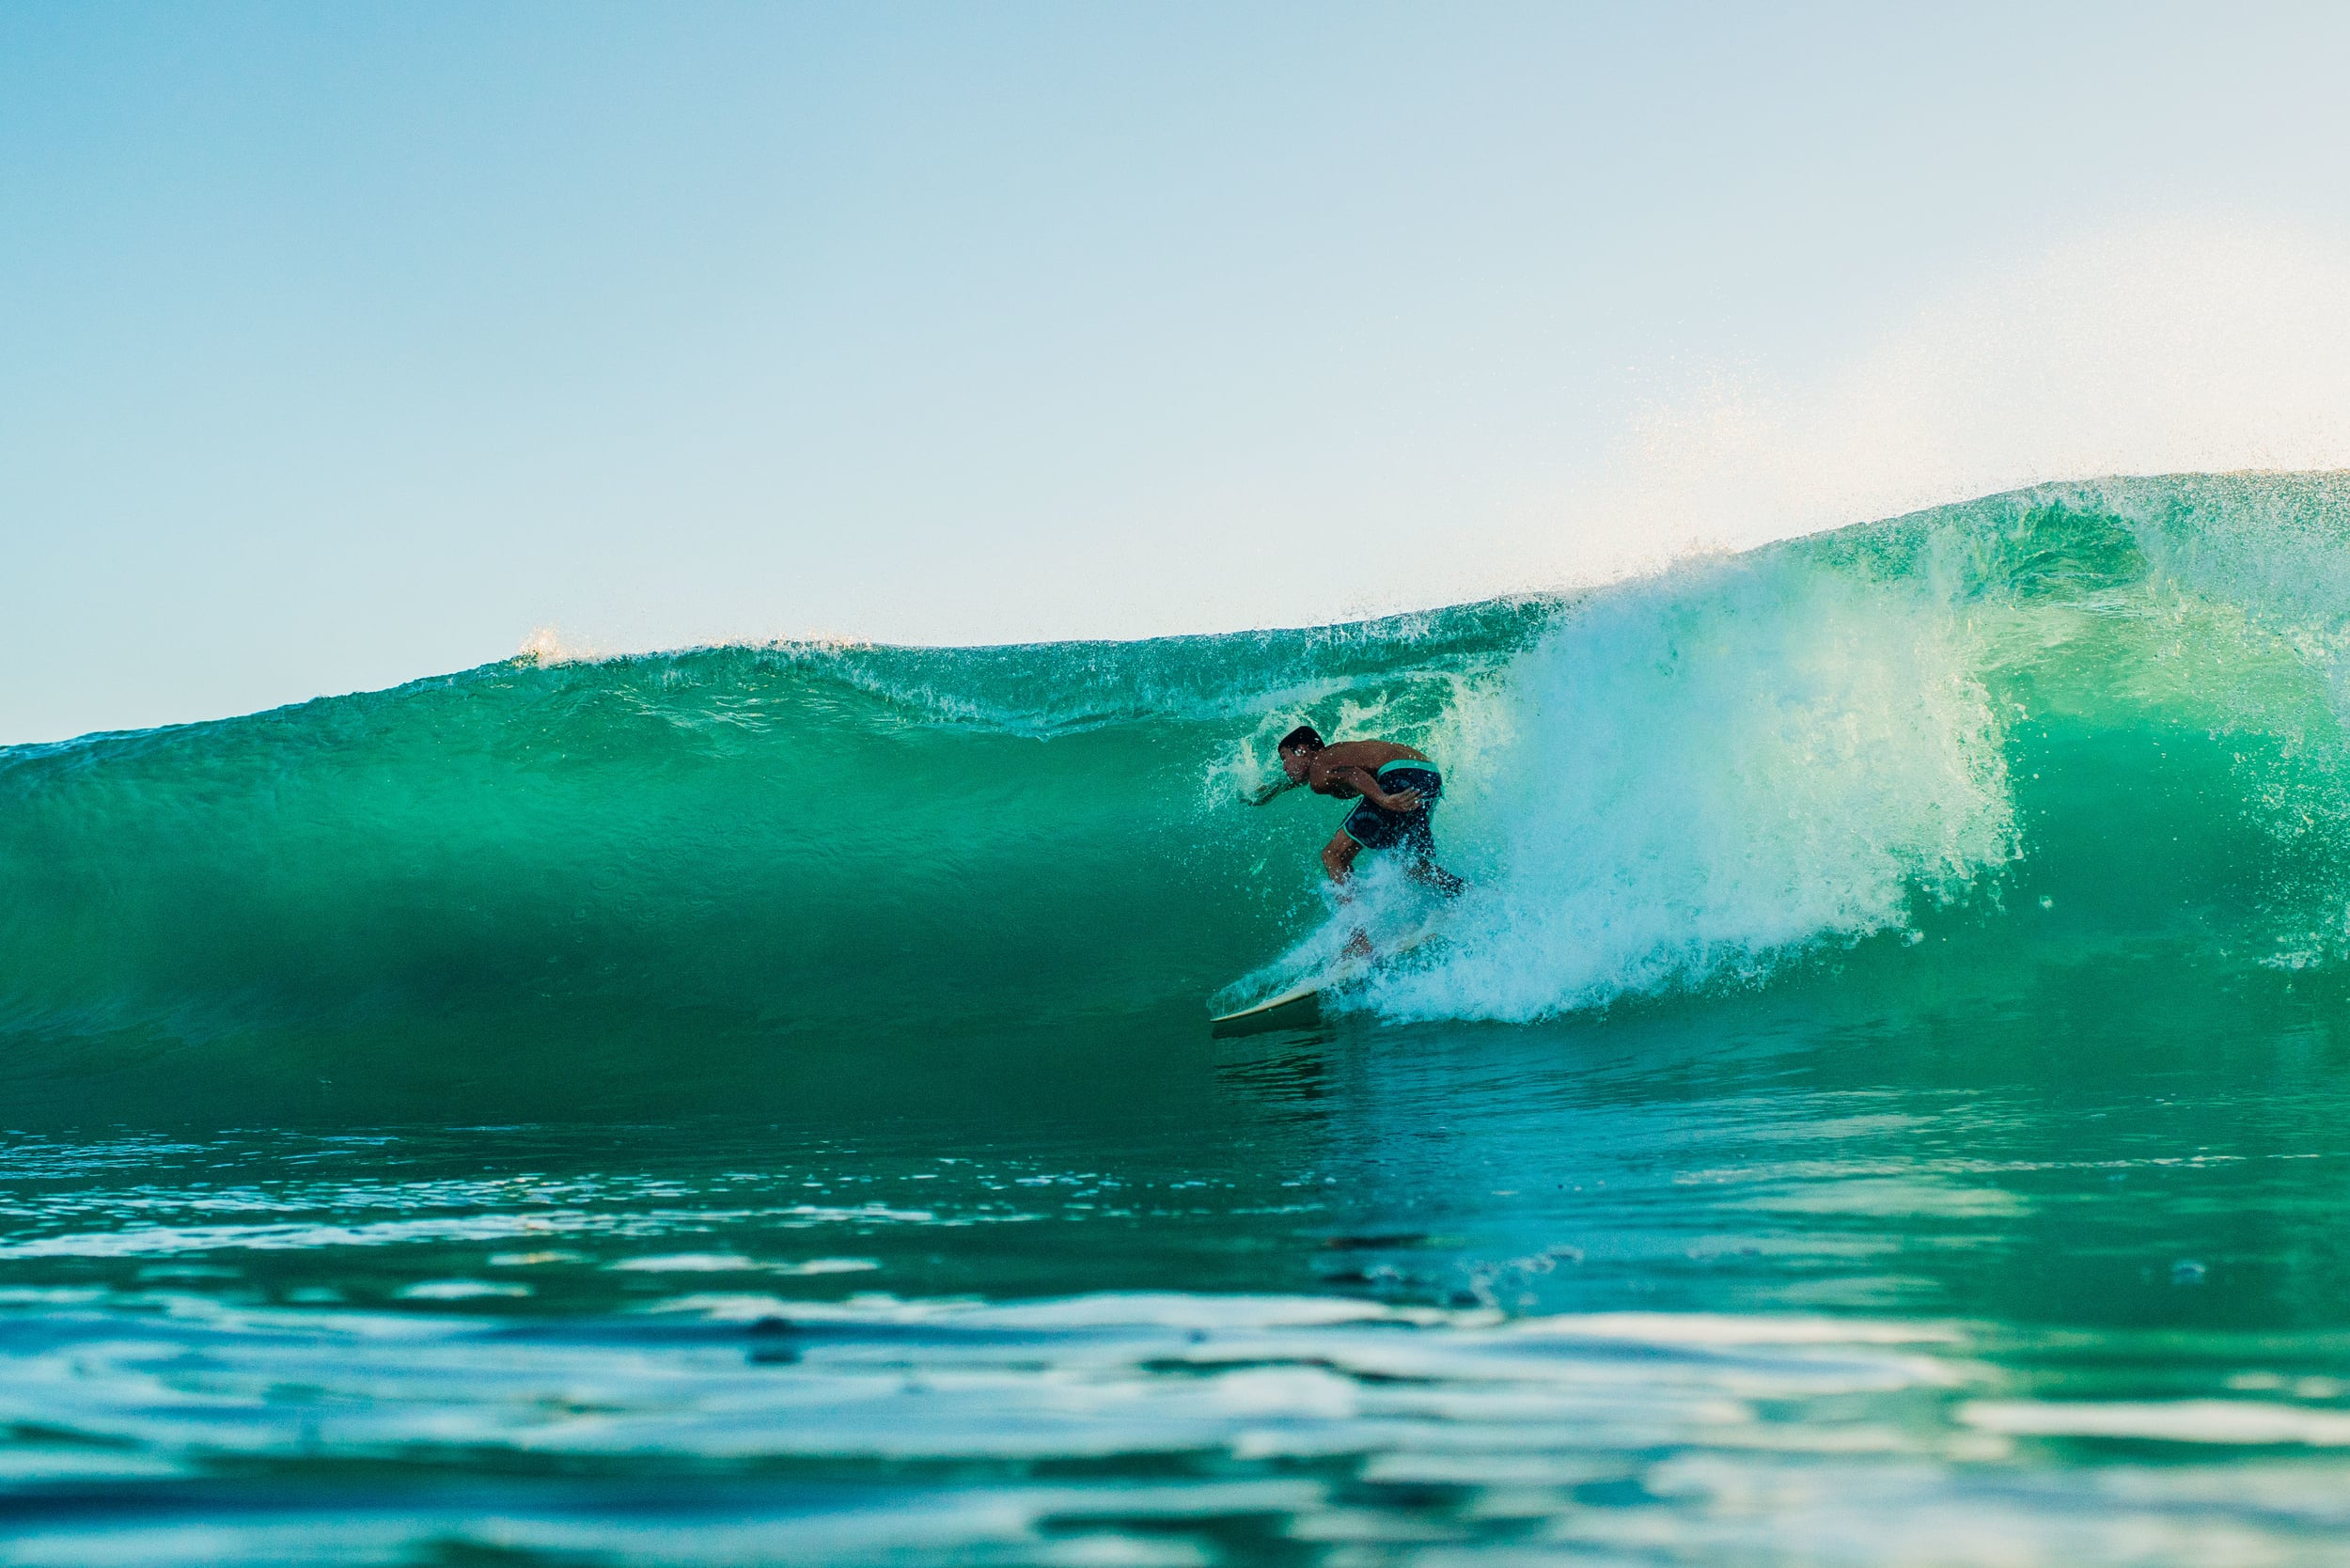 bryce-johnson-photography-kauai-hawaii-surfing-a7rii-aquatech-water-ocean.jpg